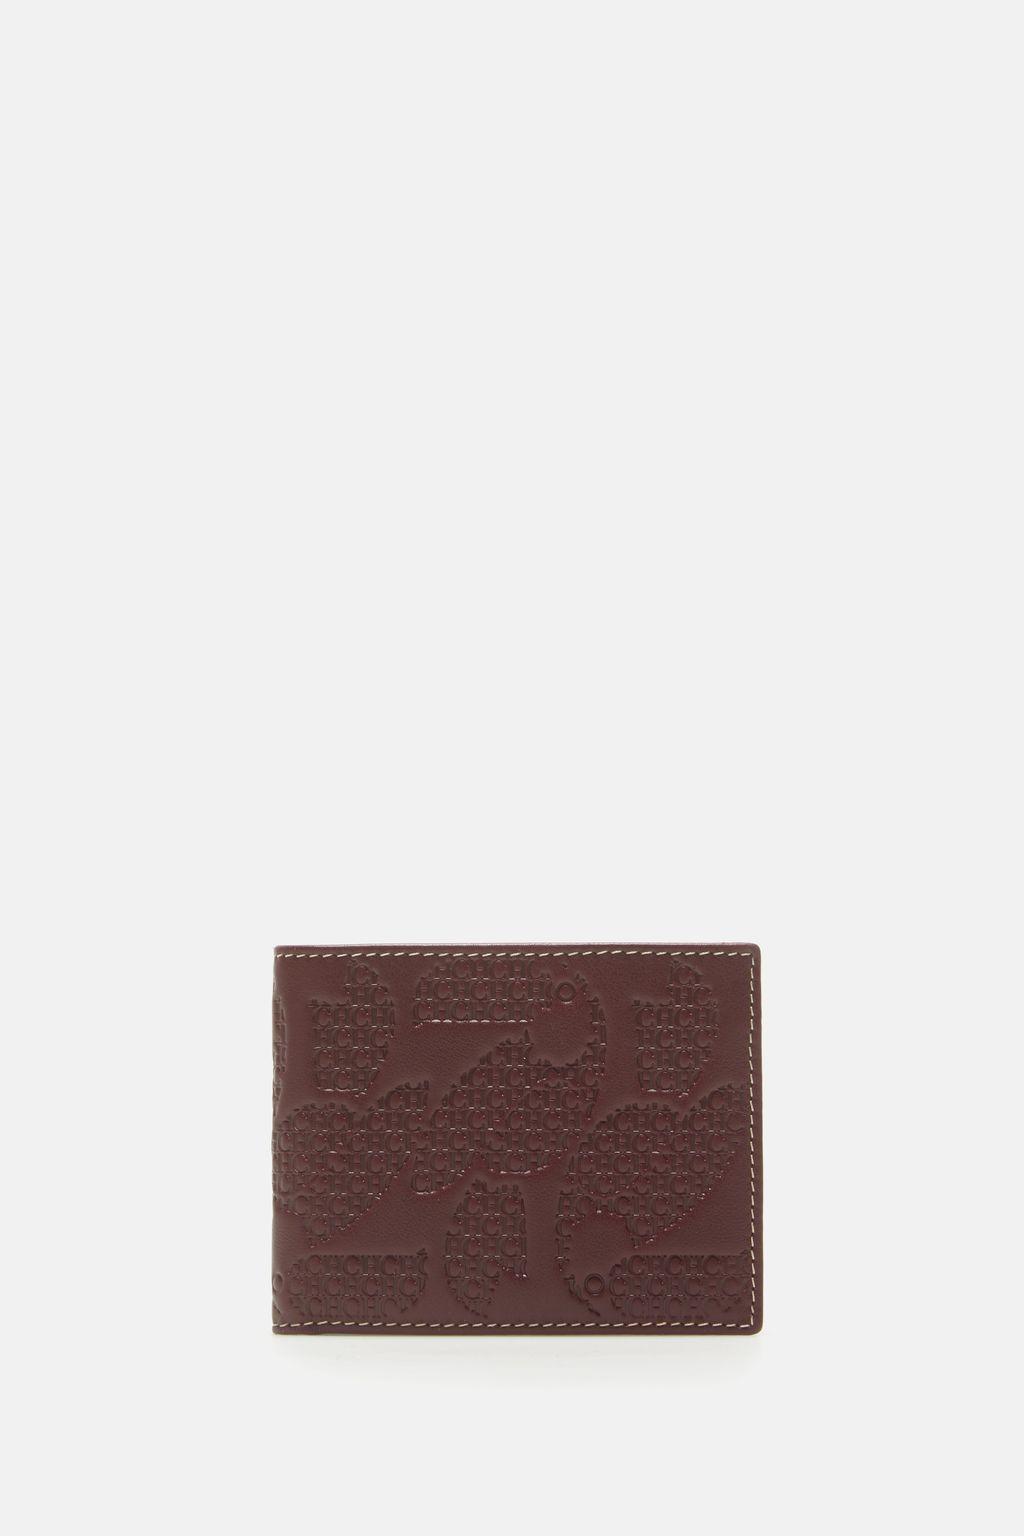 Touky | Billfold 6 wallet